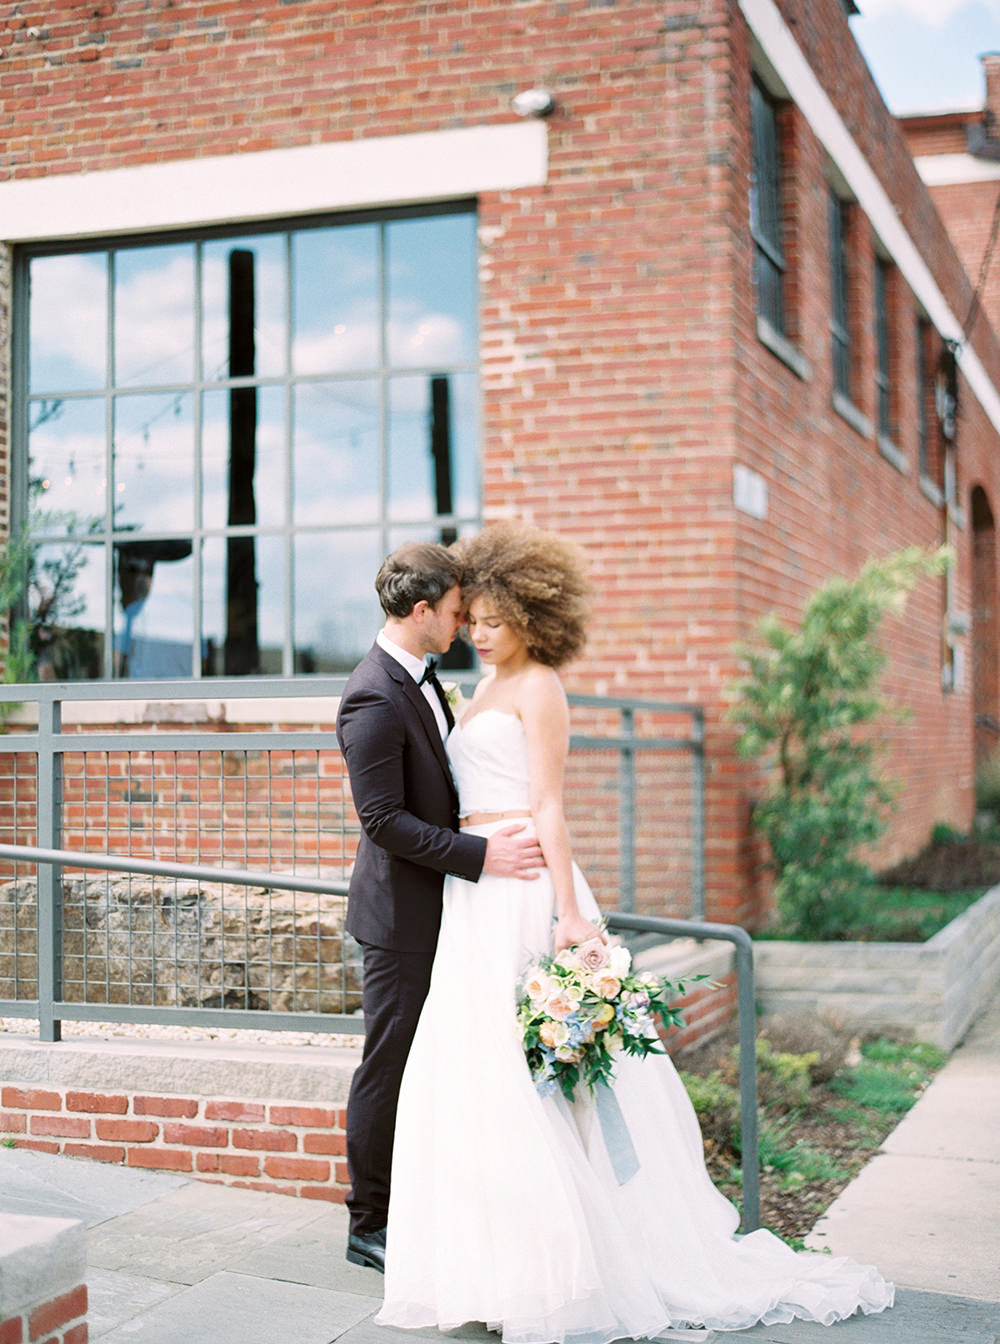 bride and groom - photo by Photos by Heart http://ruffledblog.com/downtown-birmingham-spring-wedding-inspiration